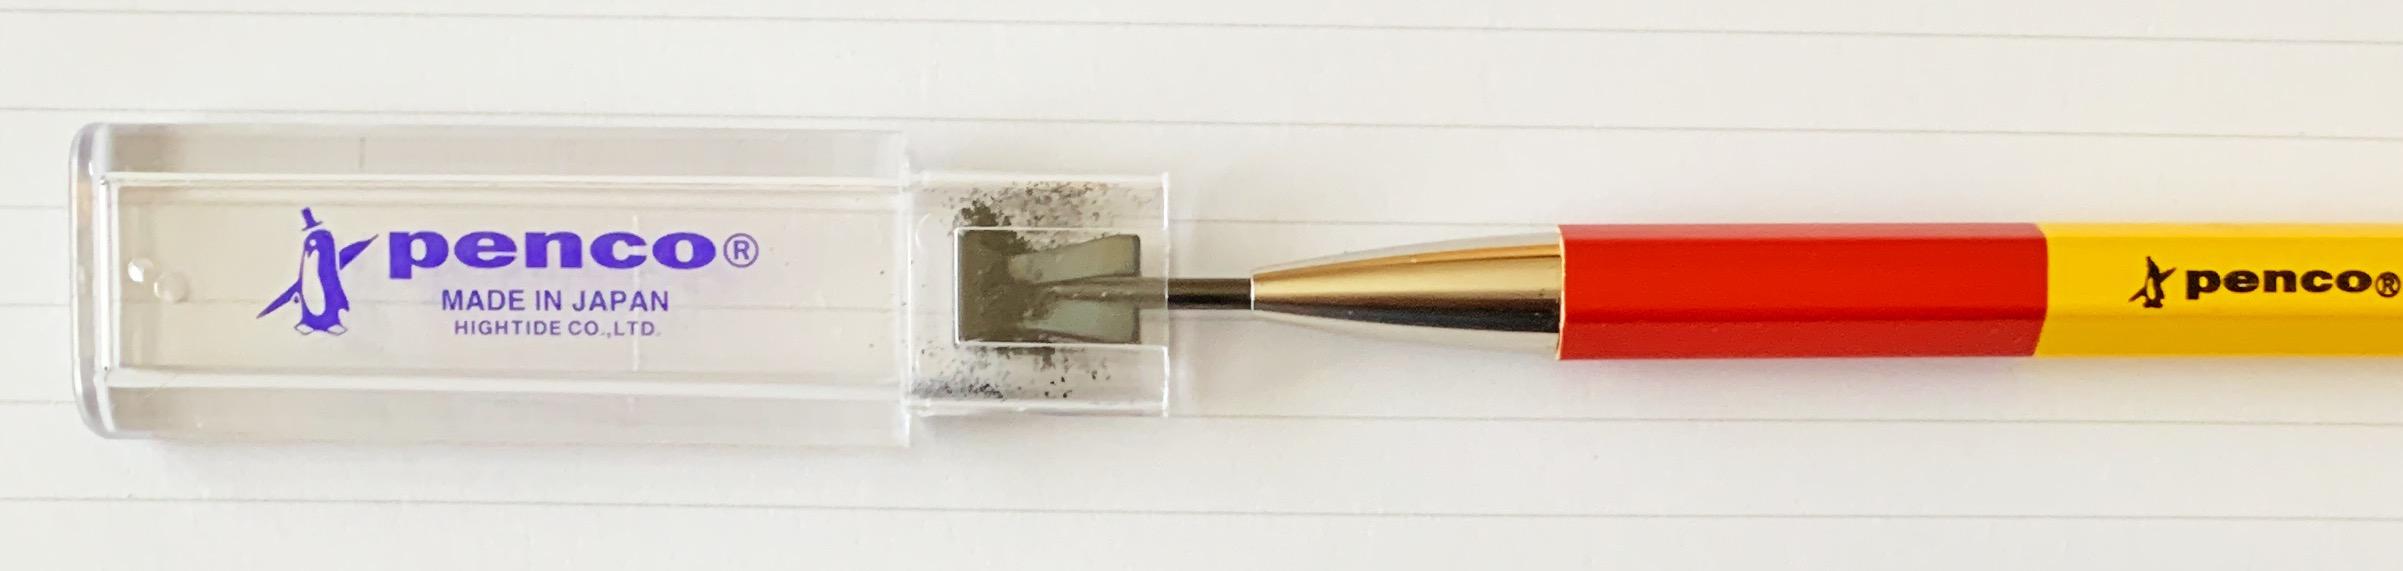 Penco Prime Timber 2.0 mm Mechanical Pencil Sharpener